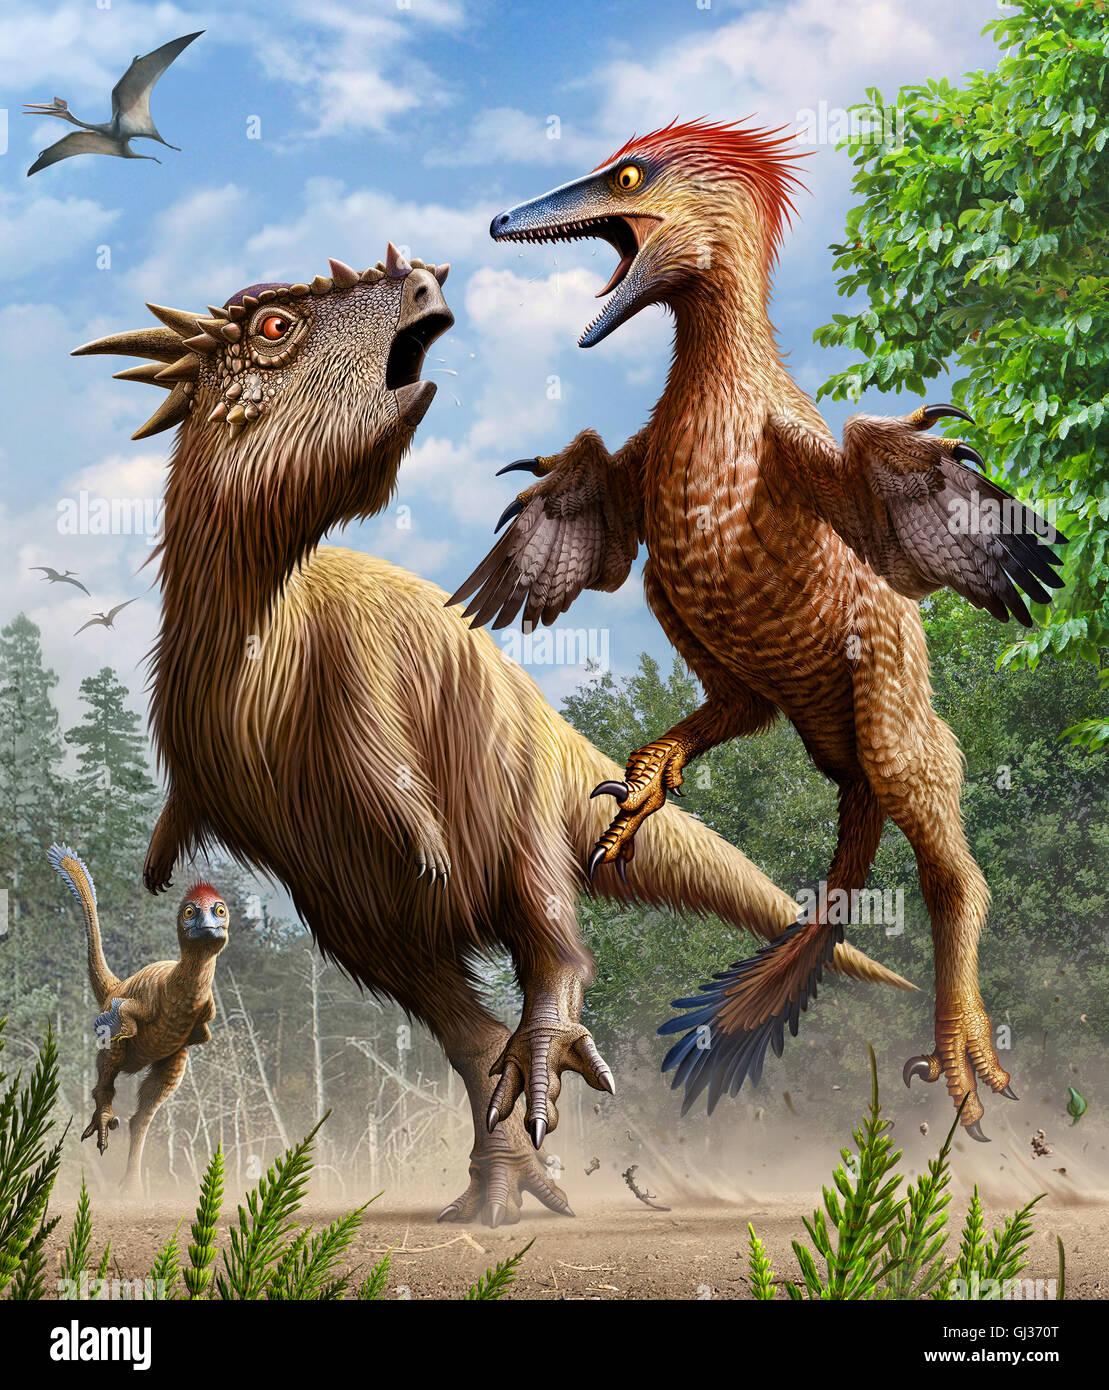 Pectinodon bakkeri VS Stygimoloch - Stock Image